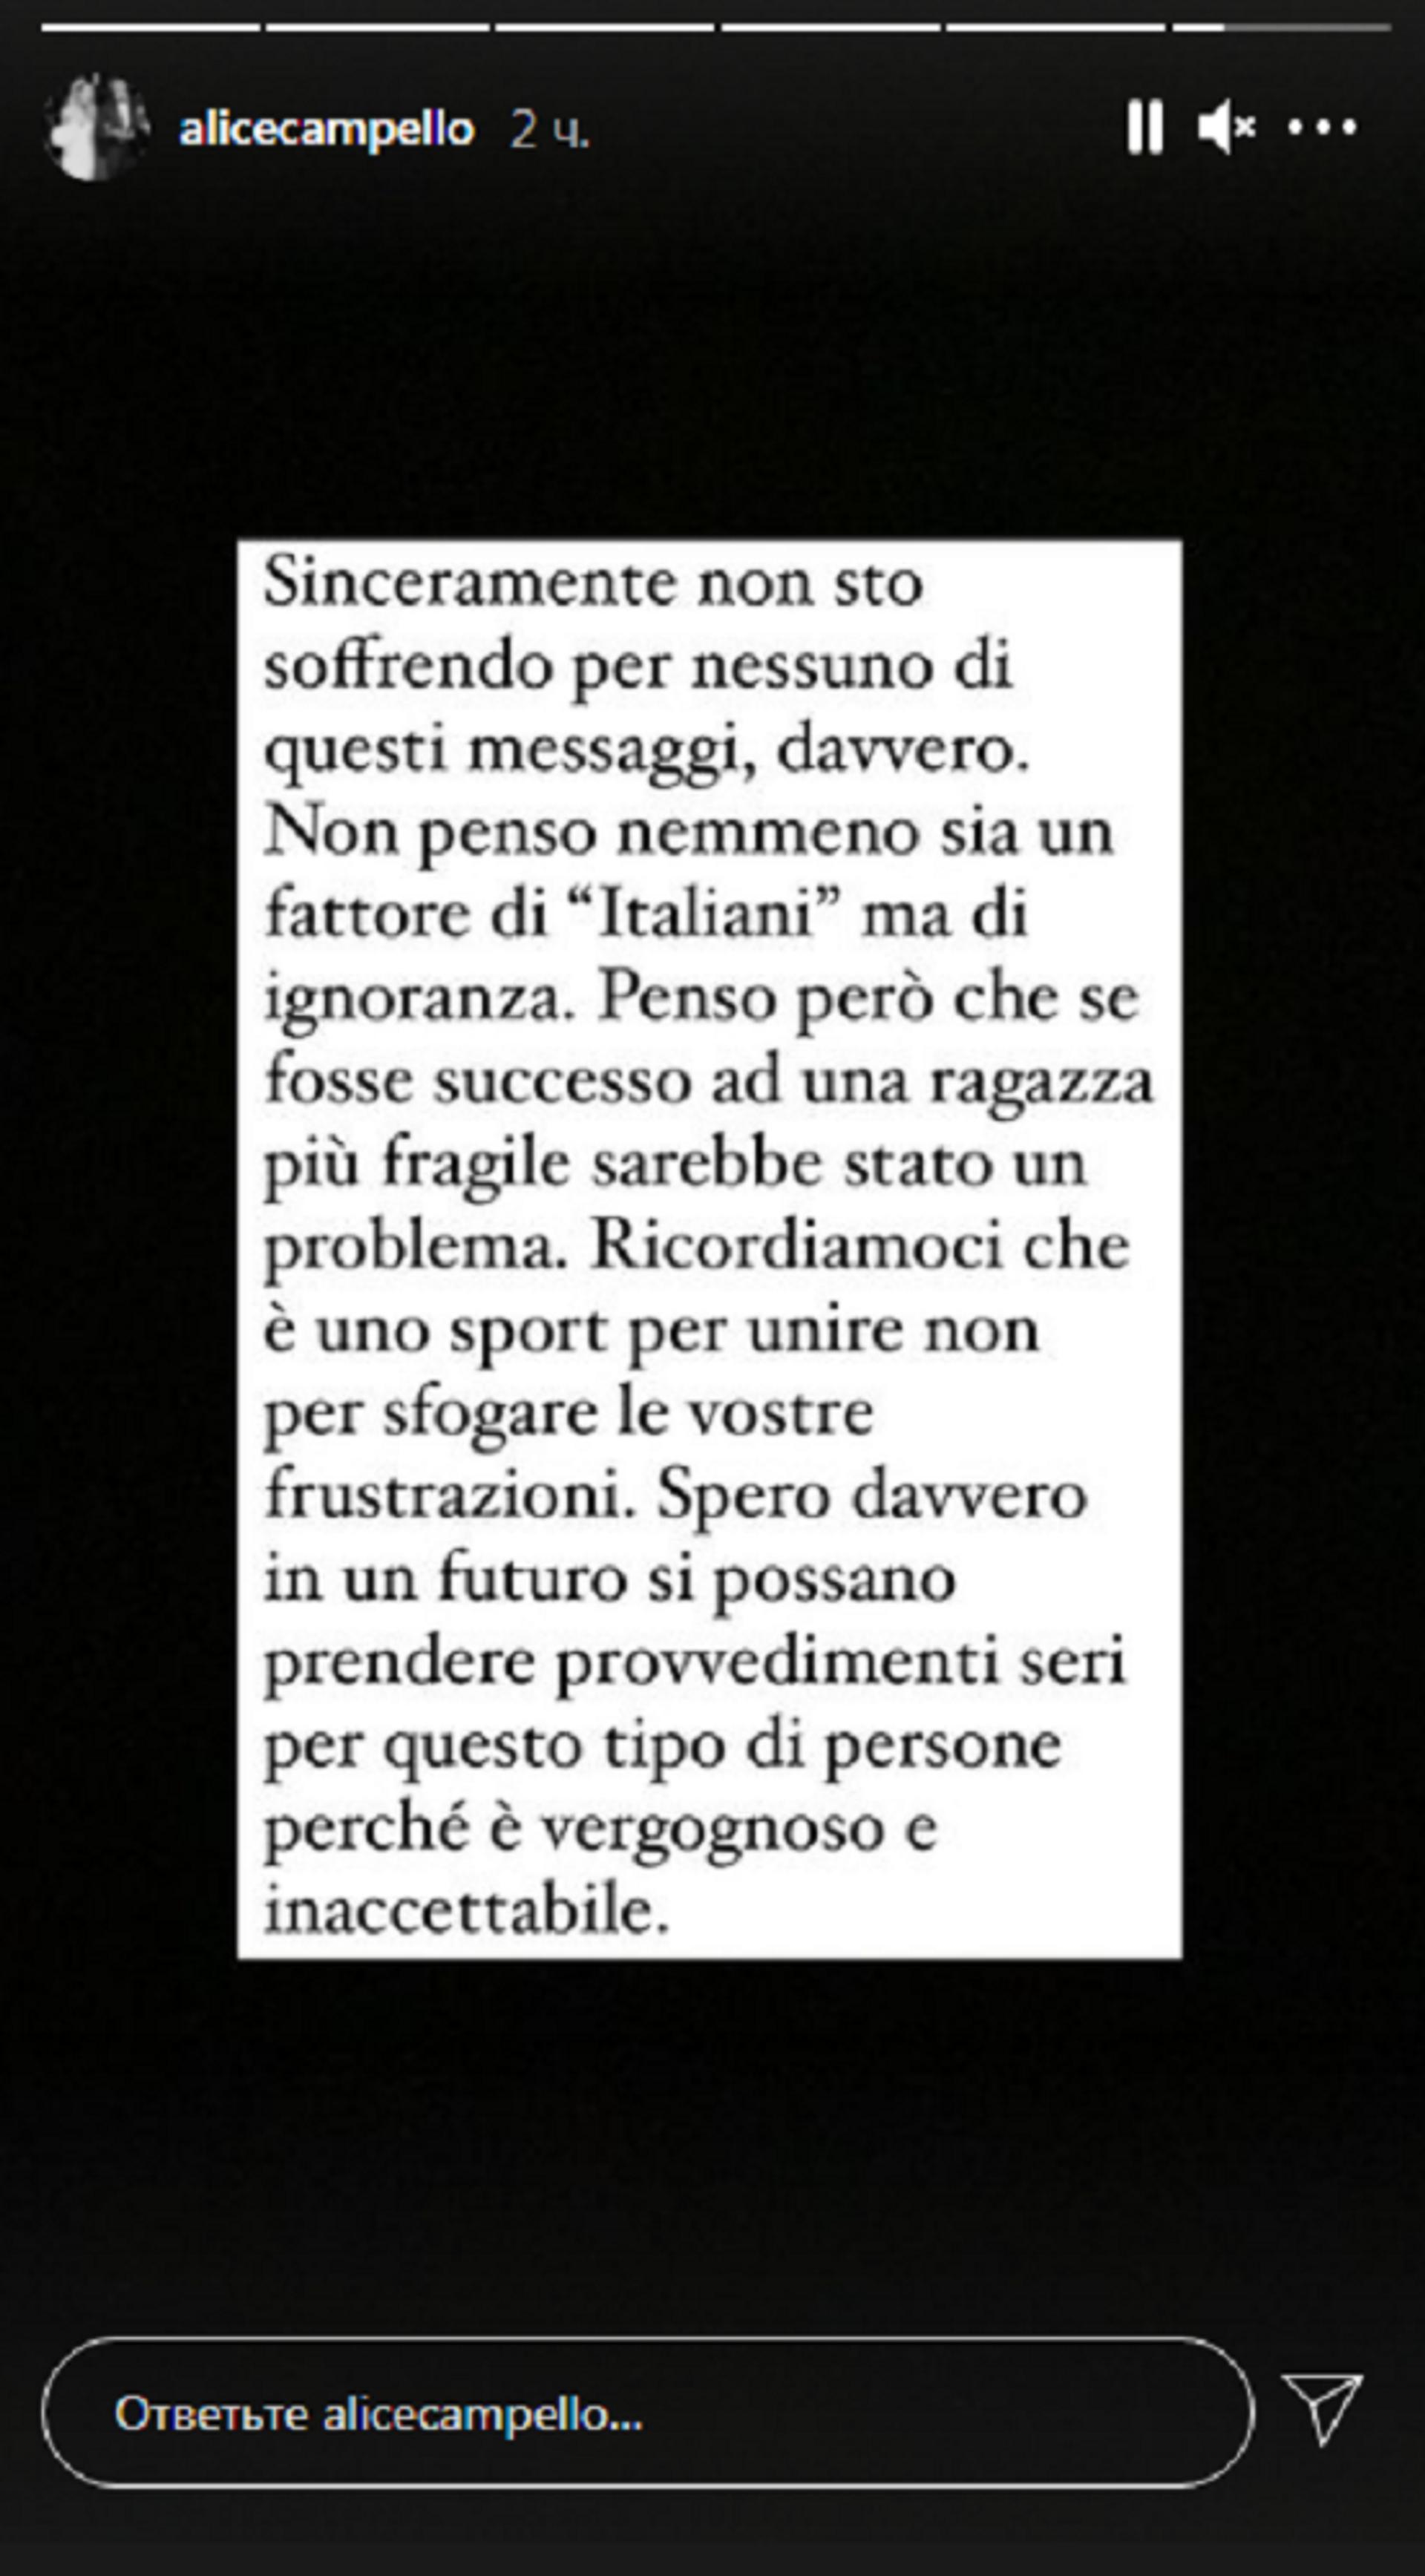 Alice Campello Instagram - Sputnik Italia, 1920, 07.07.2021